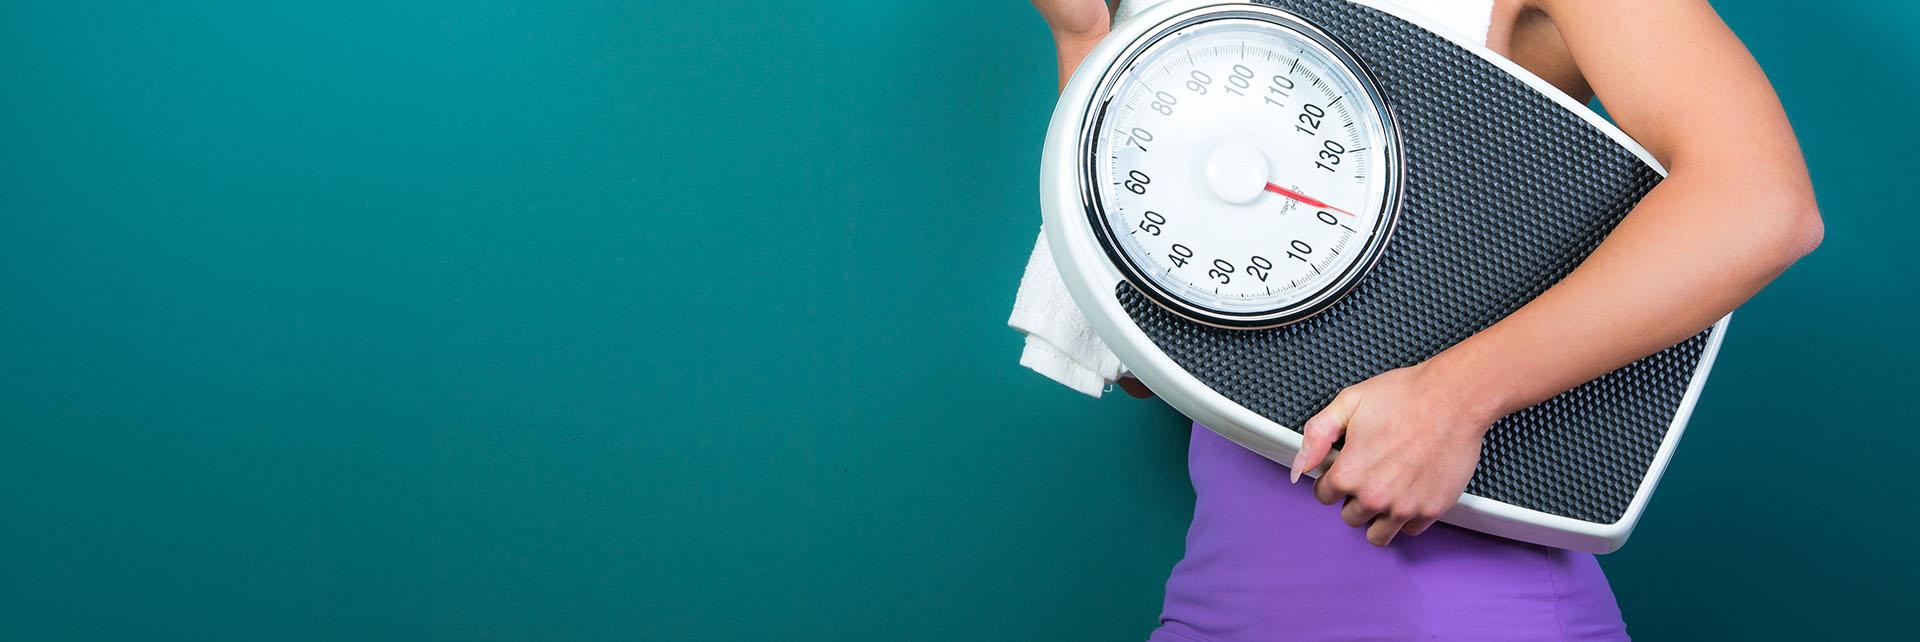 Ernährungsberatung - Gewichtsreduktion, Abnehmen, Waage